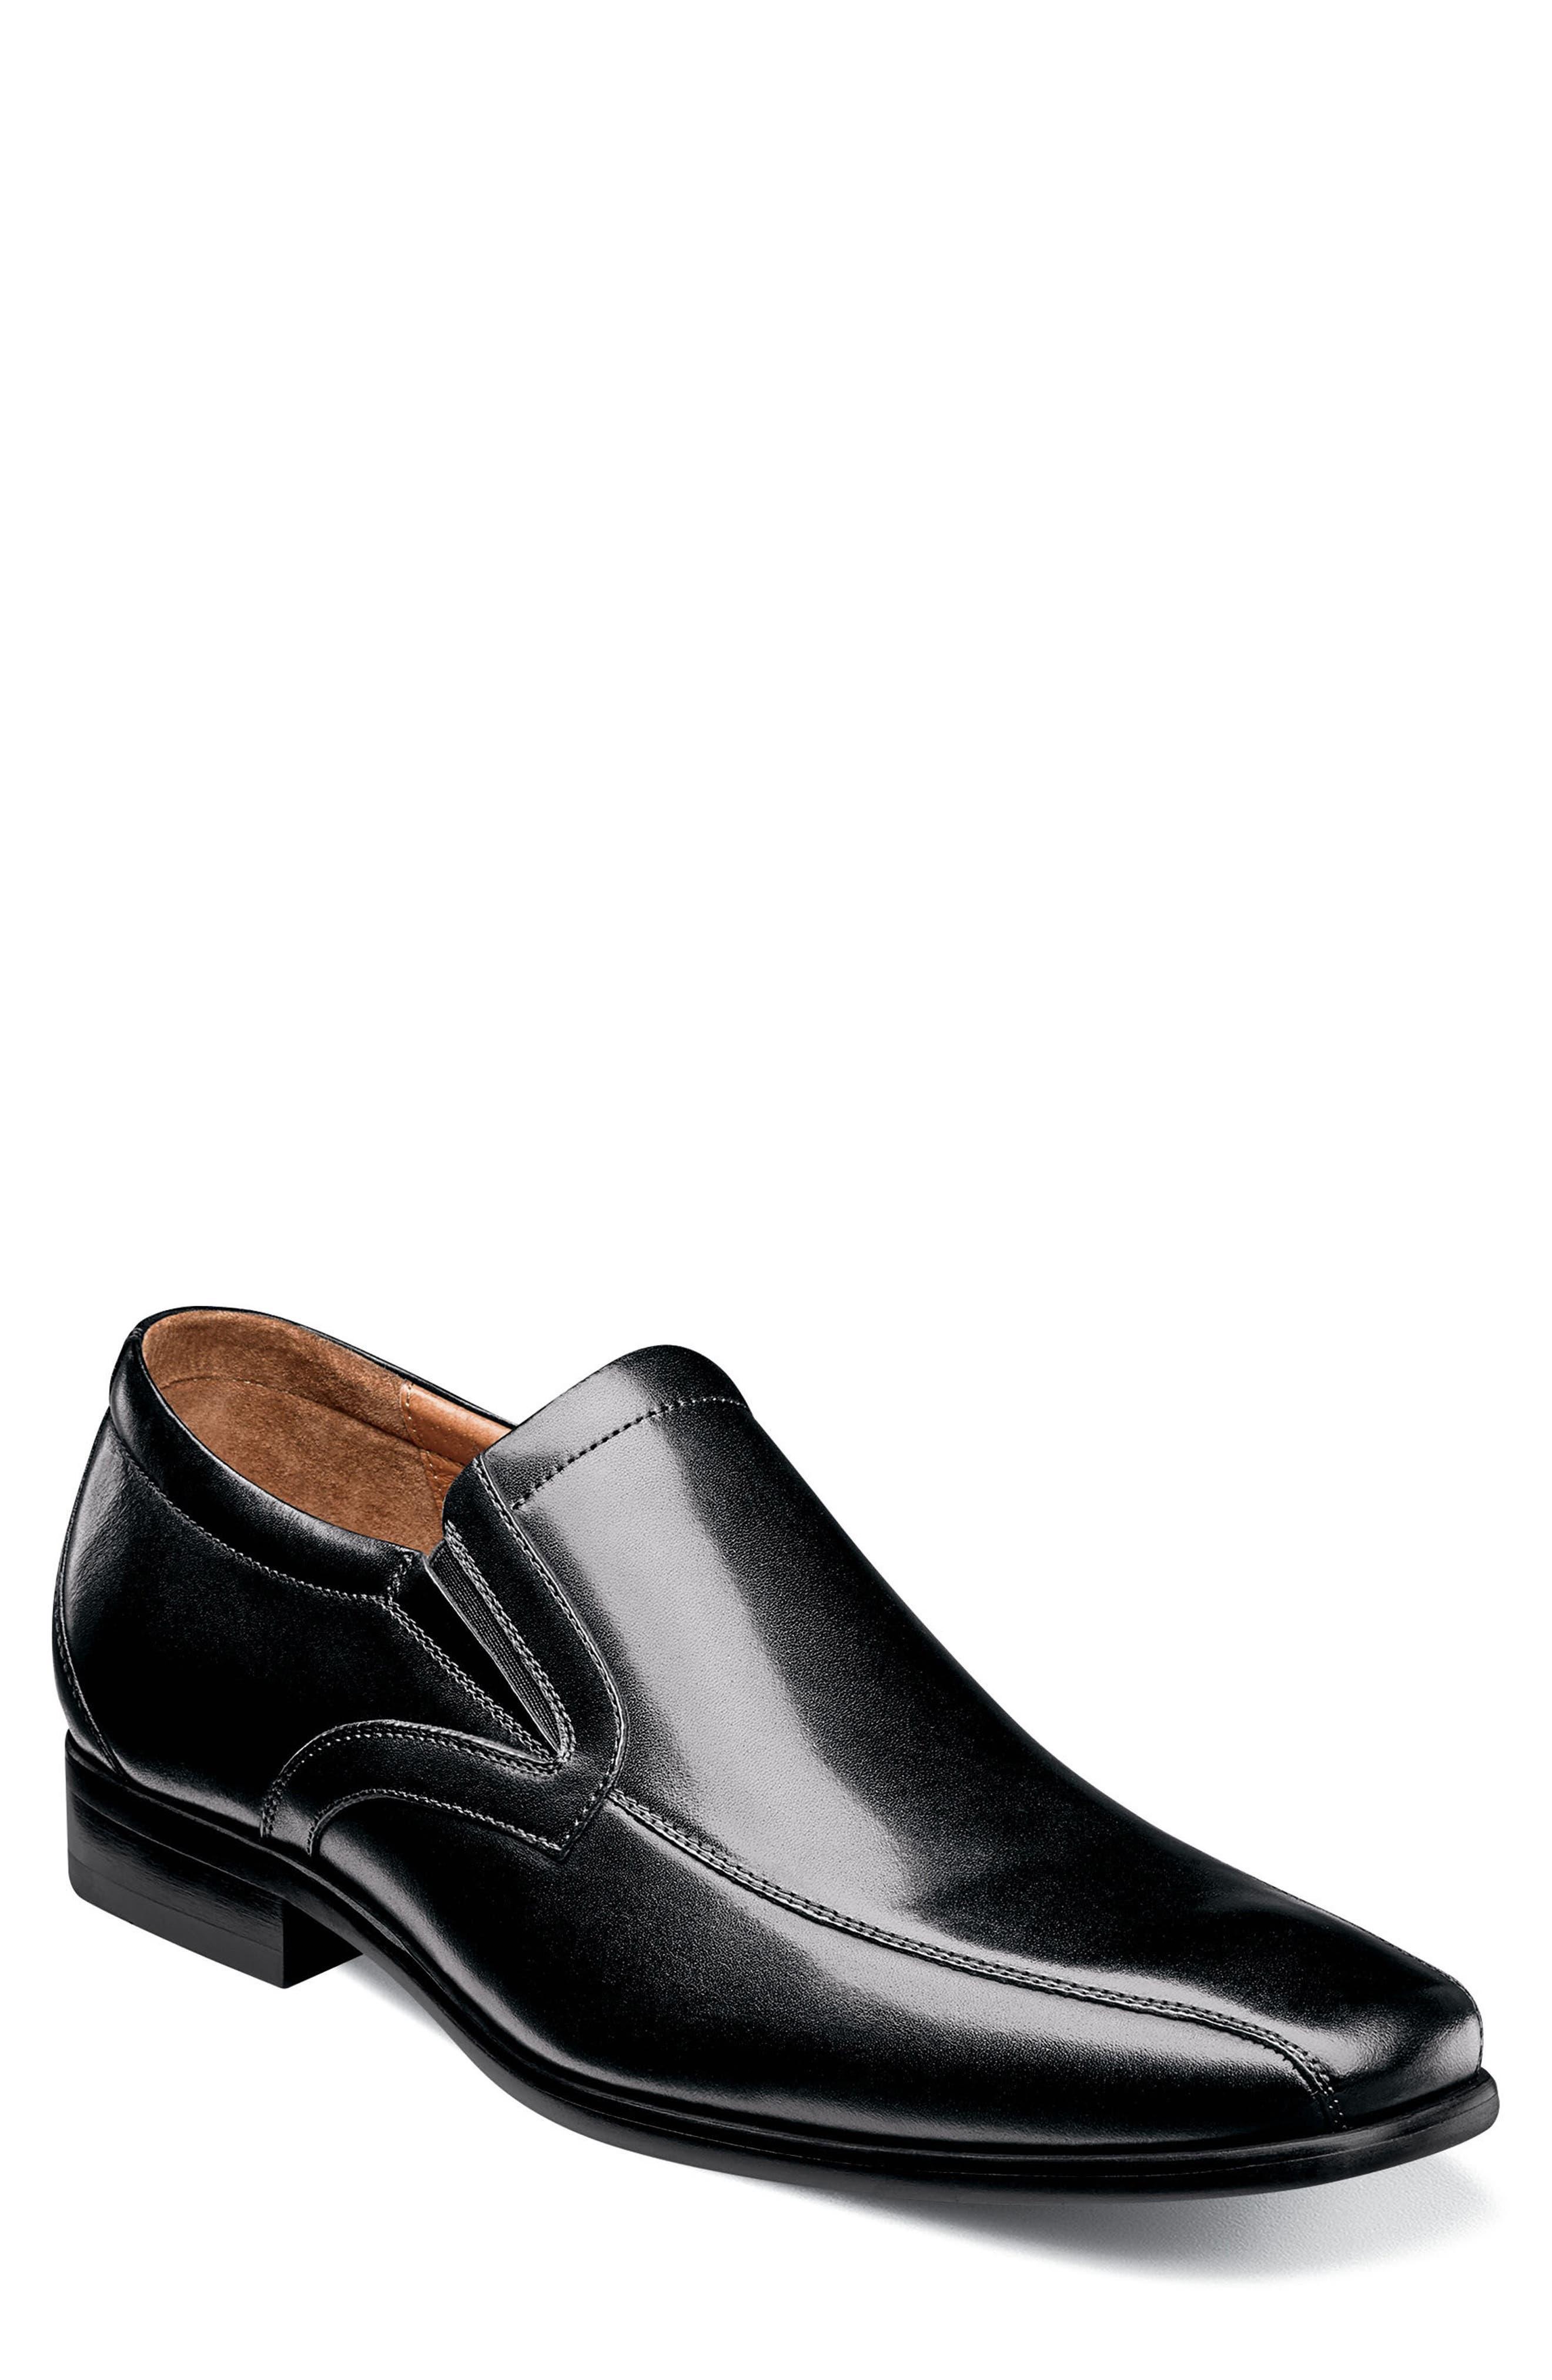 Postino Bike Toe Slip-On,                         Main,                         color, Black Leather